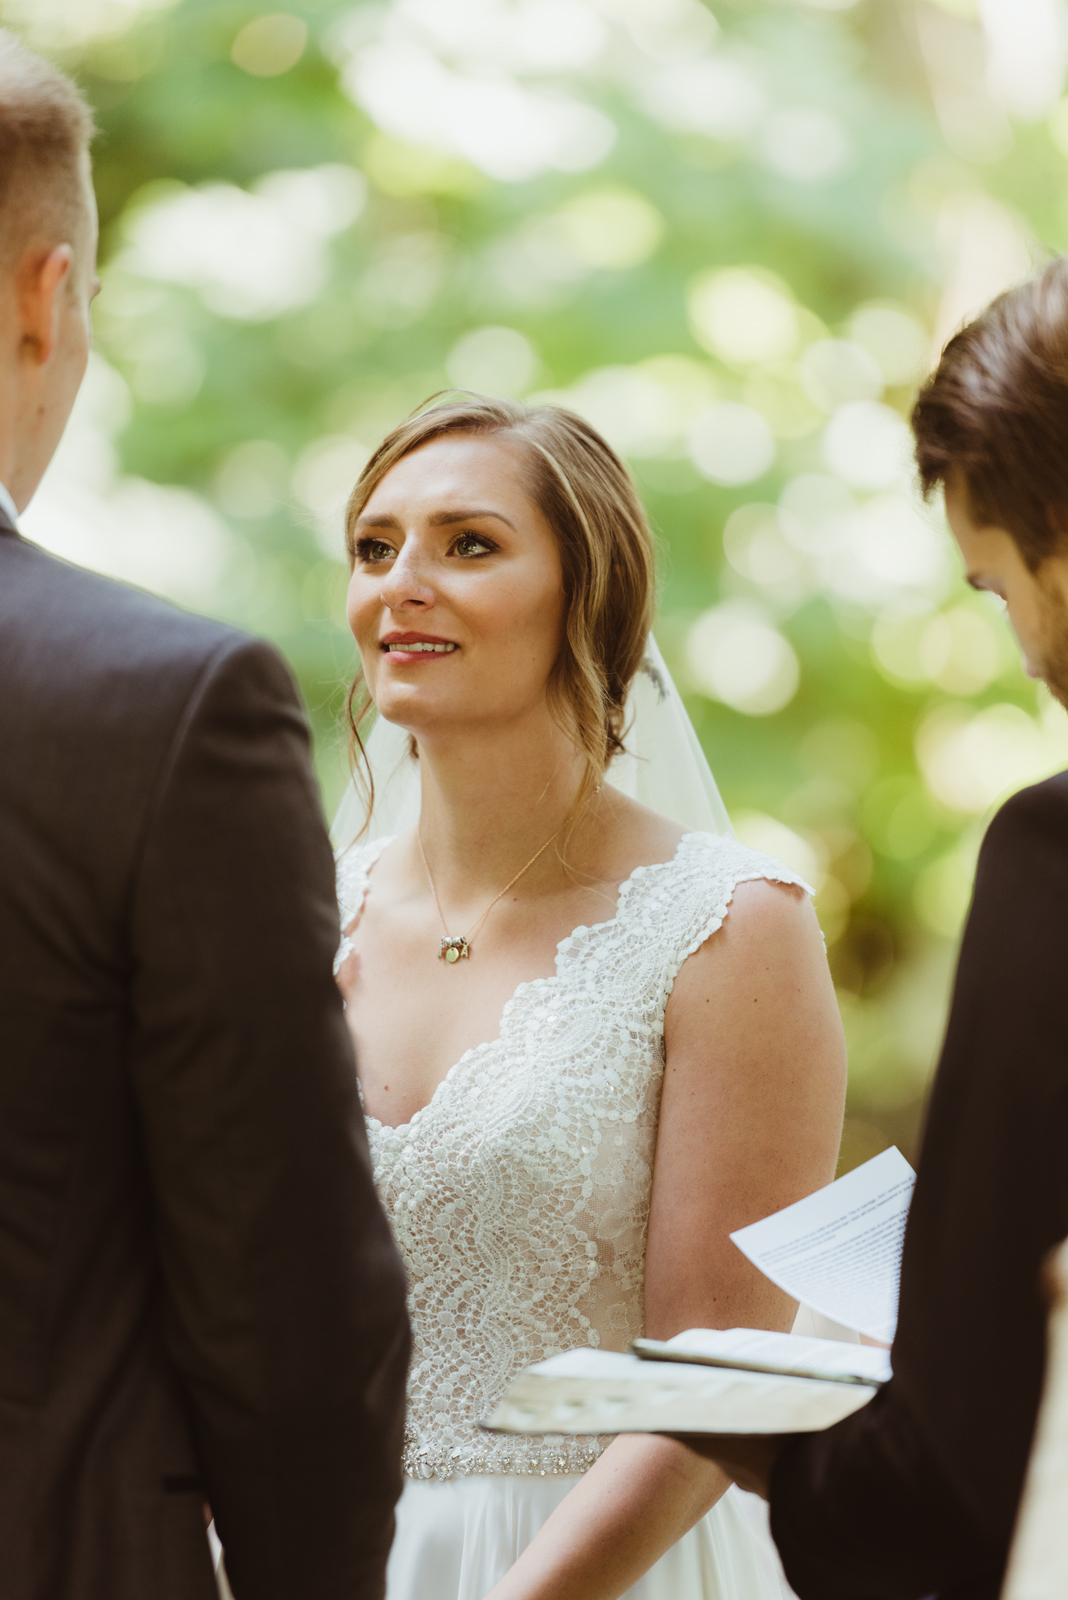 Emotional bride during wedding ceremony